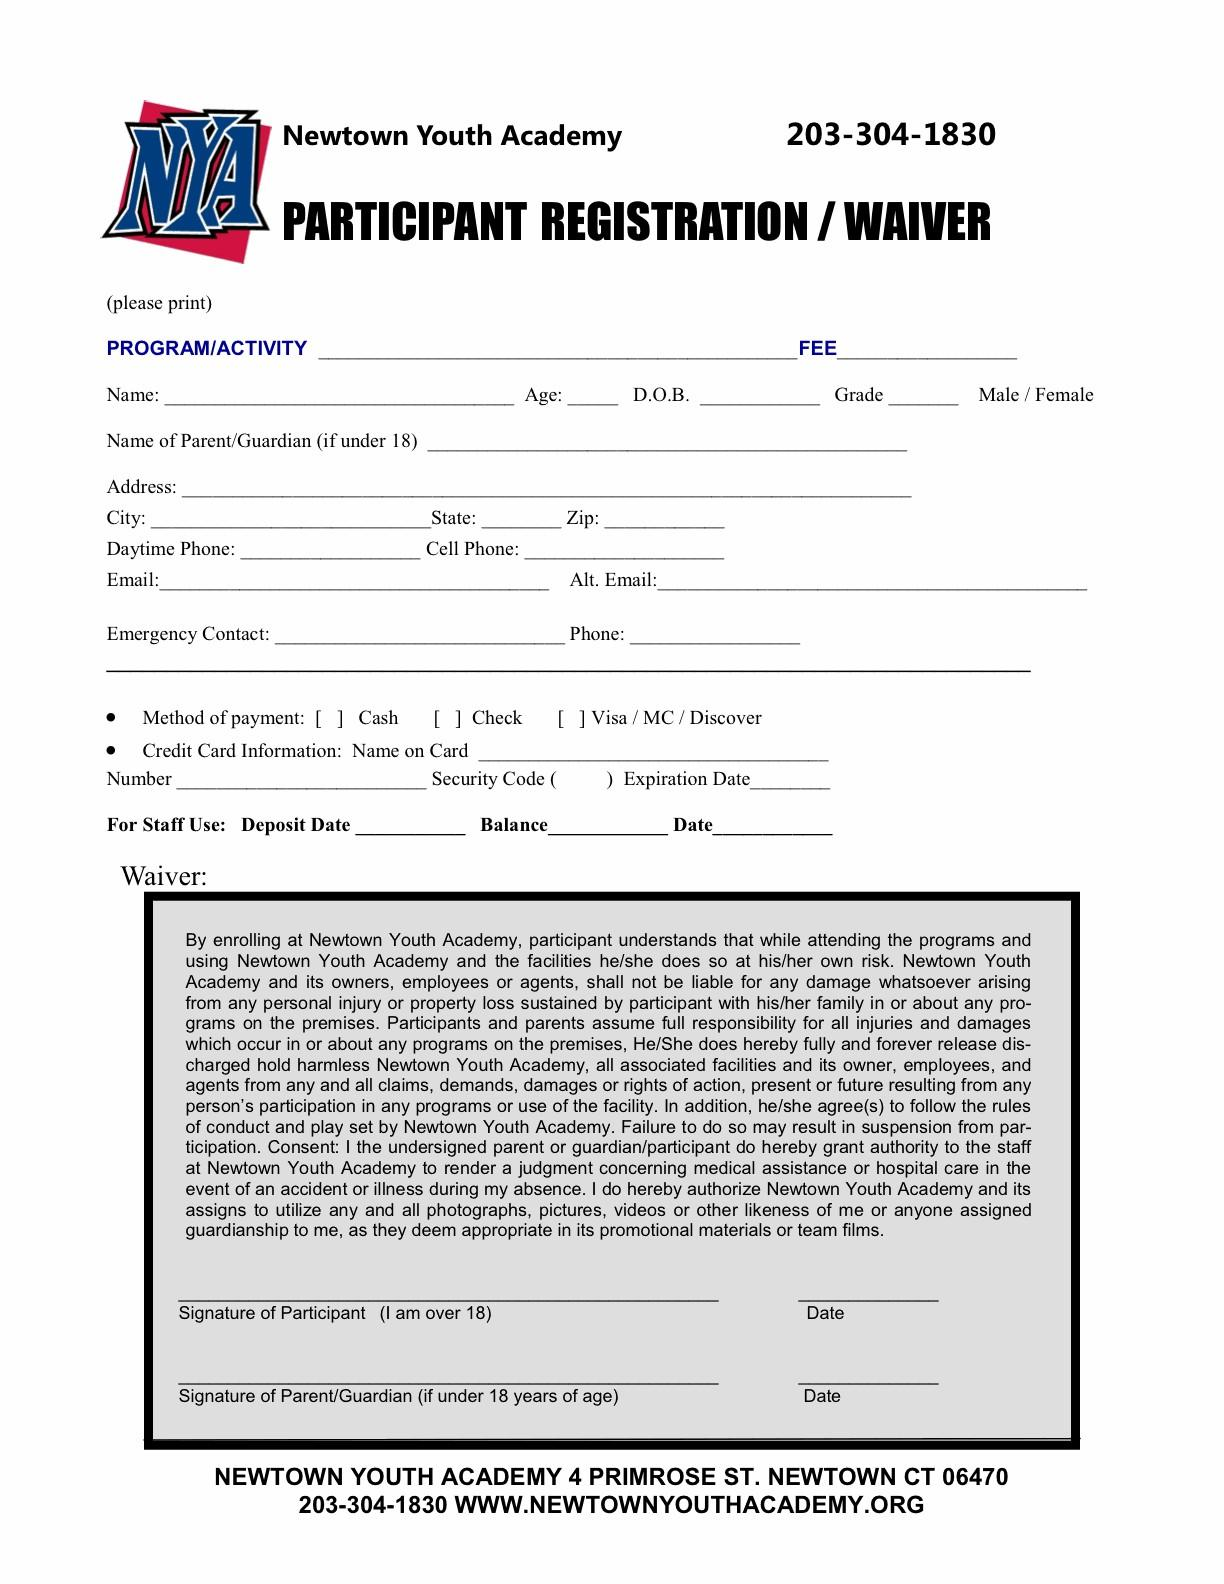 Baseball Registration Form Template